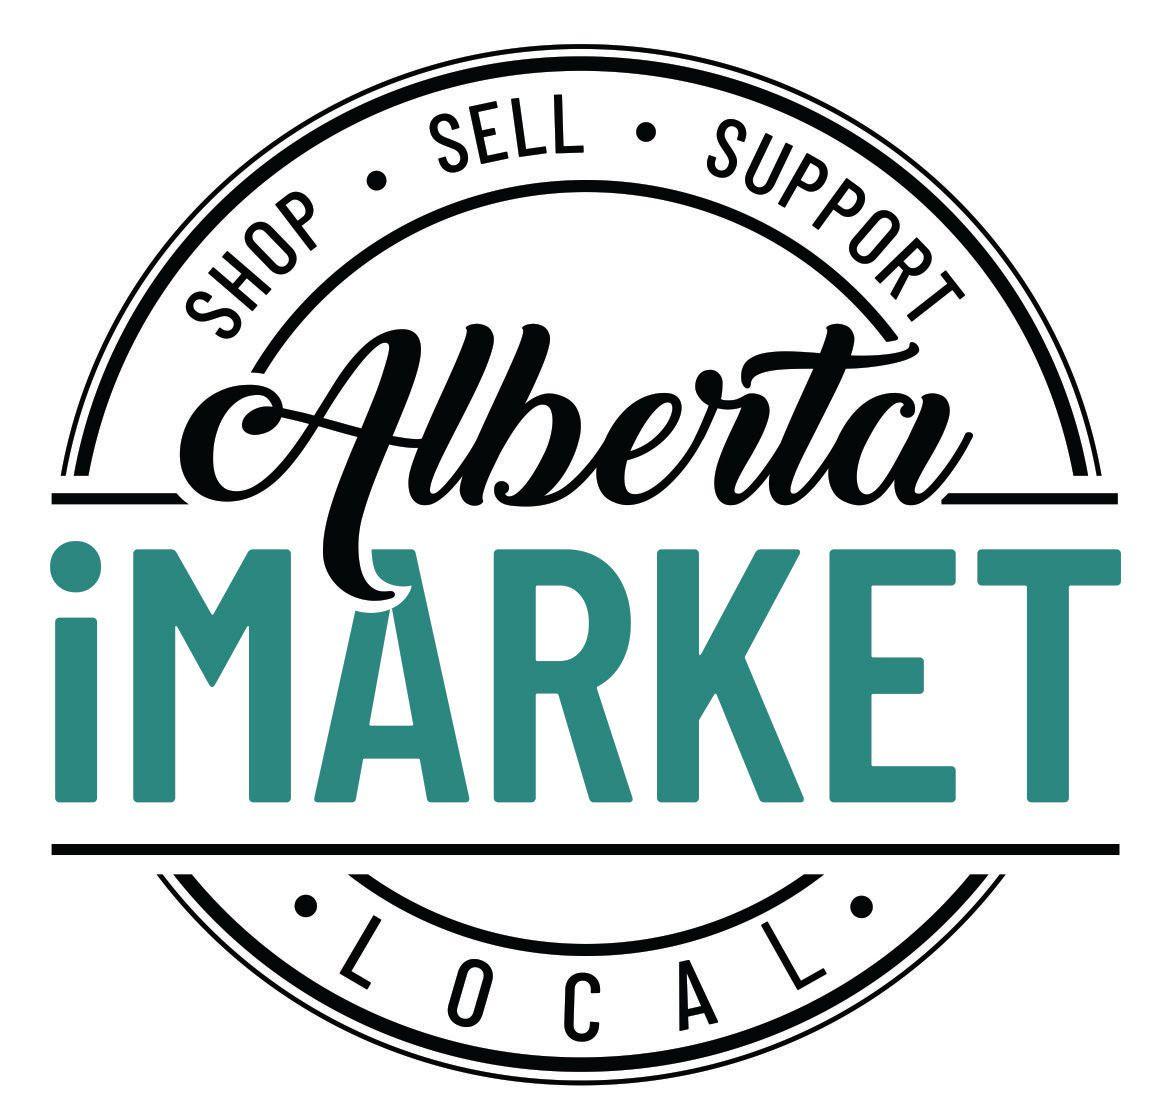 Alberta iMarket